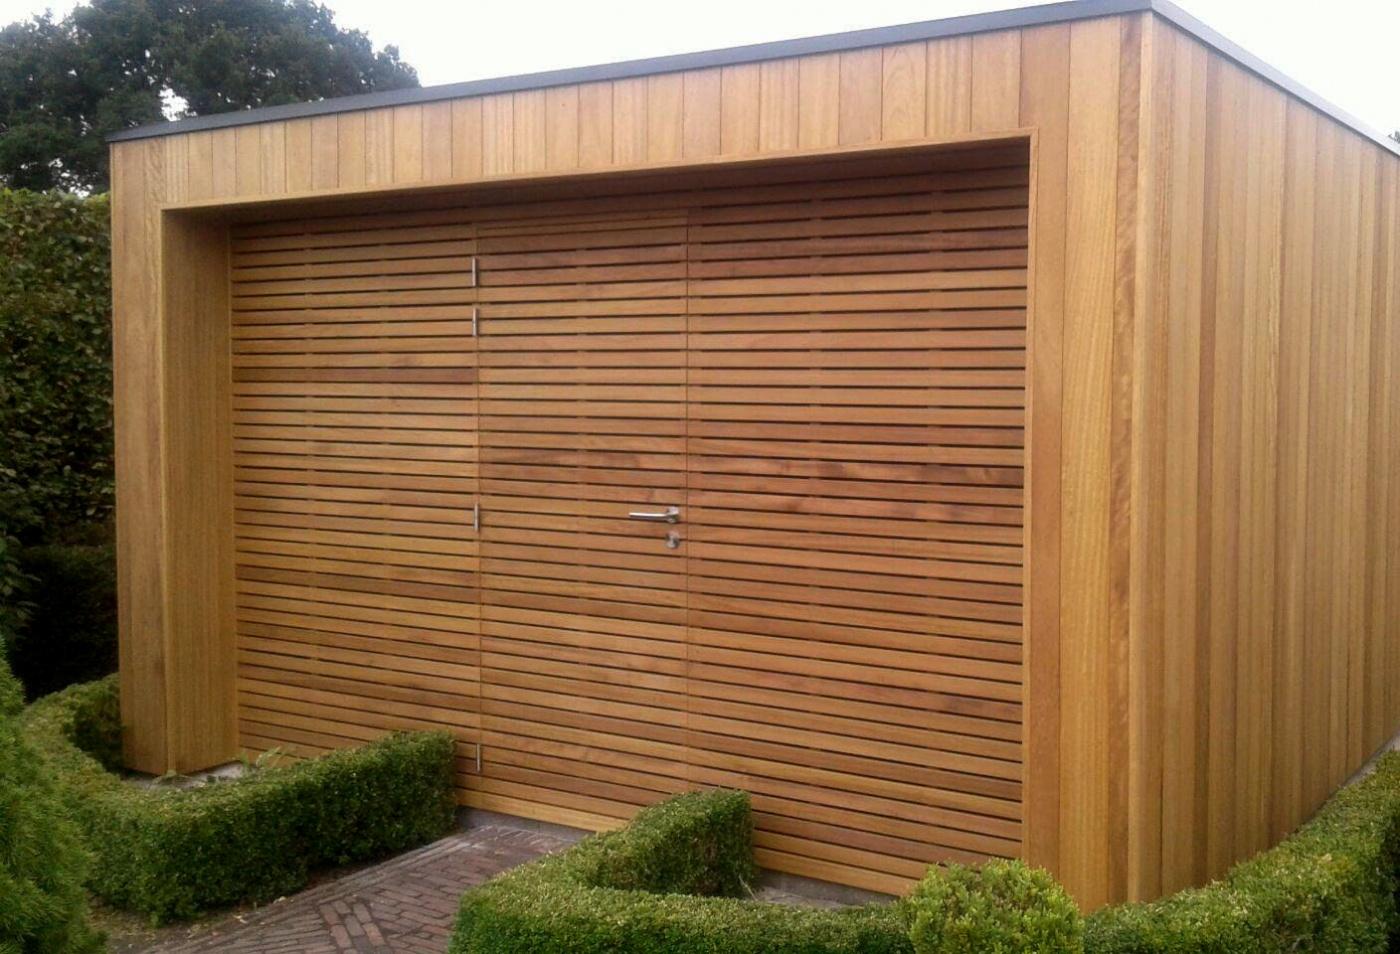 Rimini modern houten tuinhuis | moderne houten tuinbergingen